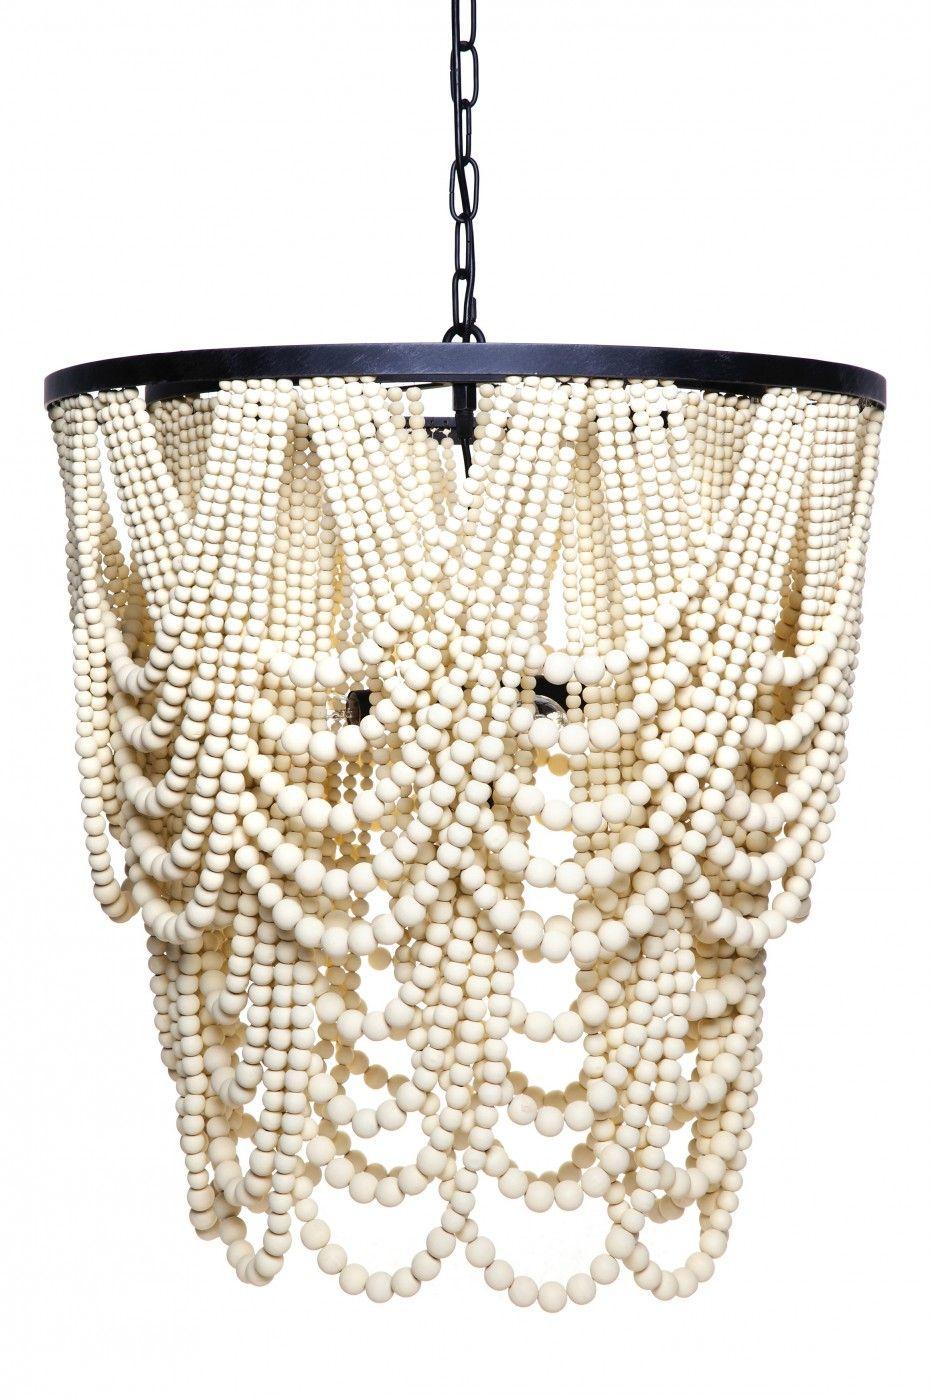 Bilgola pendant wooden beads pendant lighting and iron bigola pendant light simple iron frame with white antique wooden beads arubaitofo Image collections